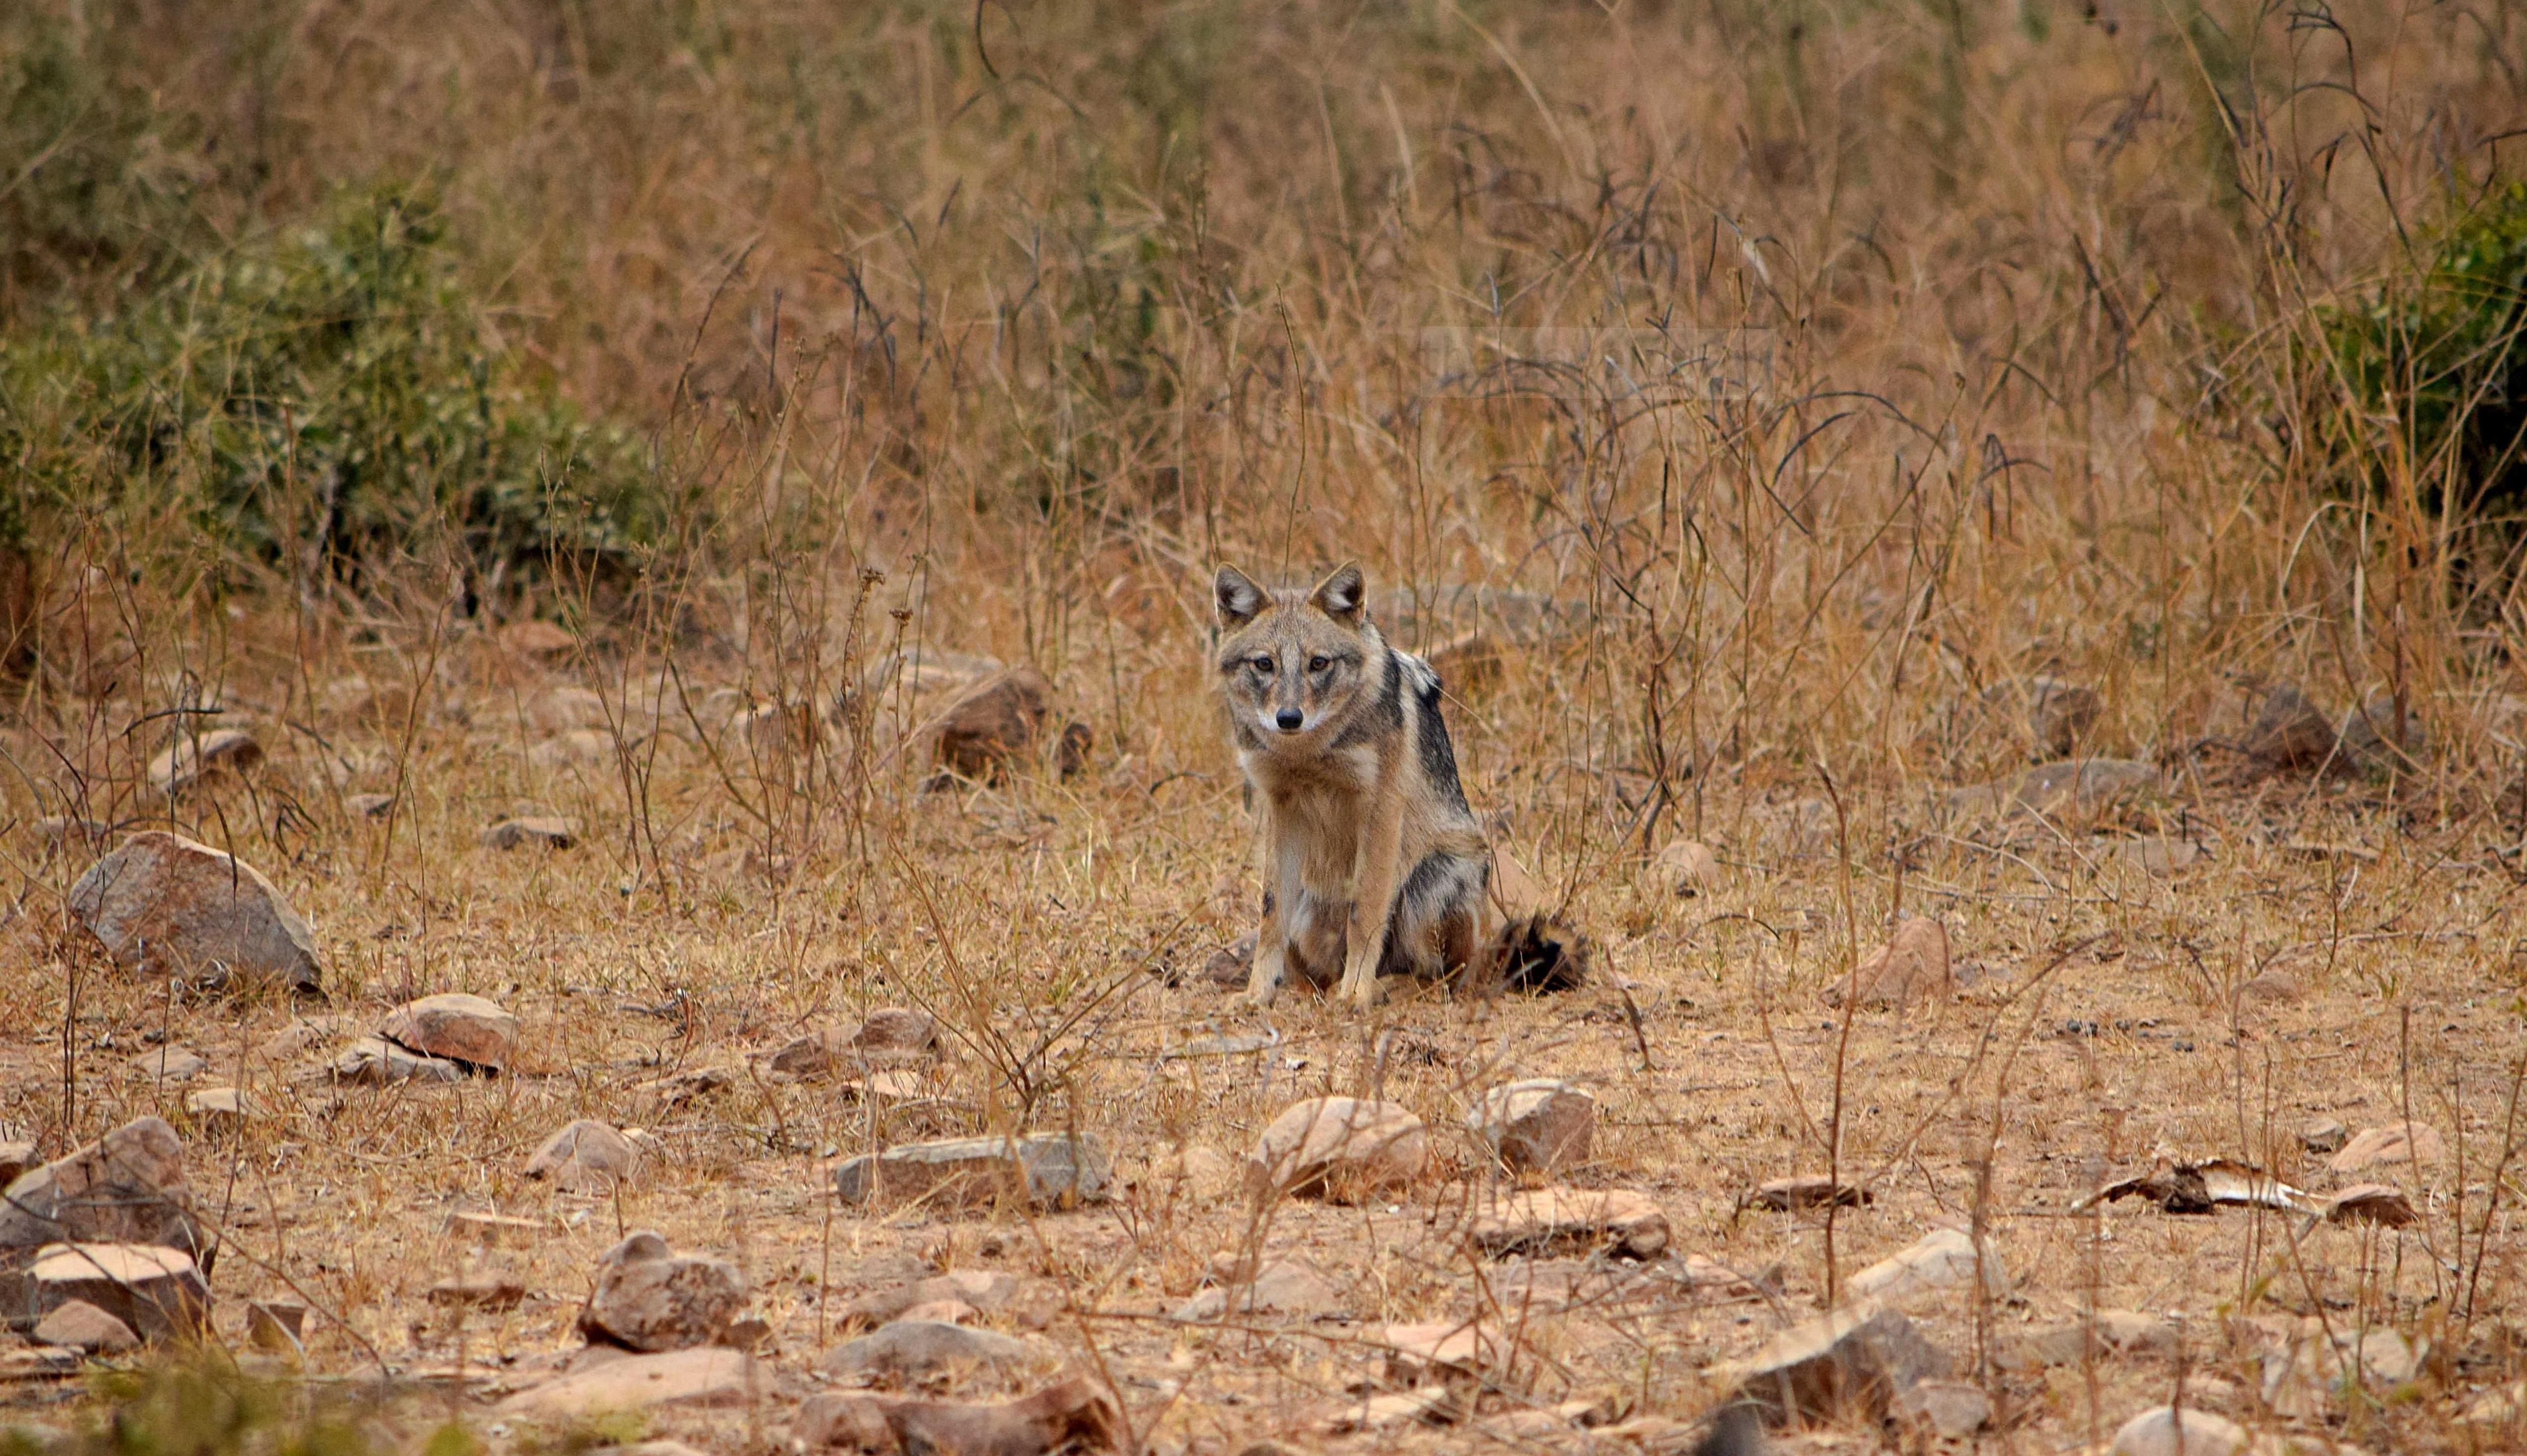 The angry jackal